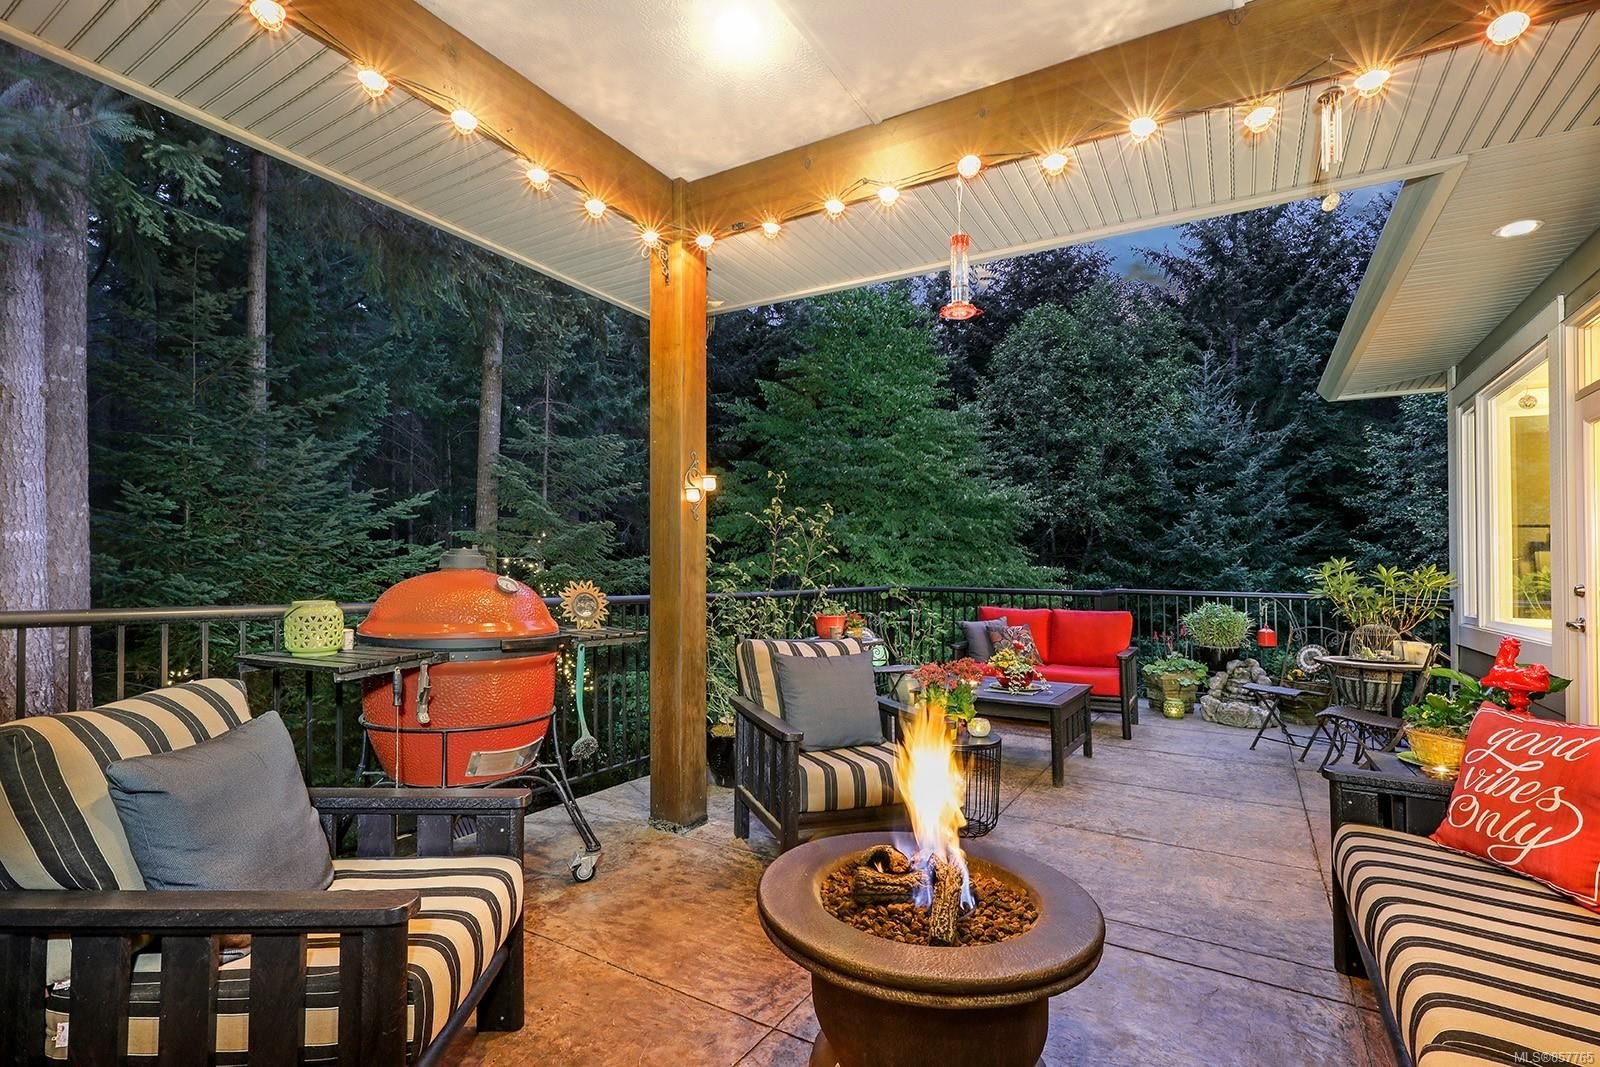 Photo 5: Photos: 1516 Highridge Dr in : CV Comox (Town of) House for sale (Comox Valley)  : MLS®# 857765